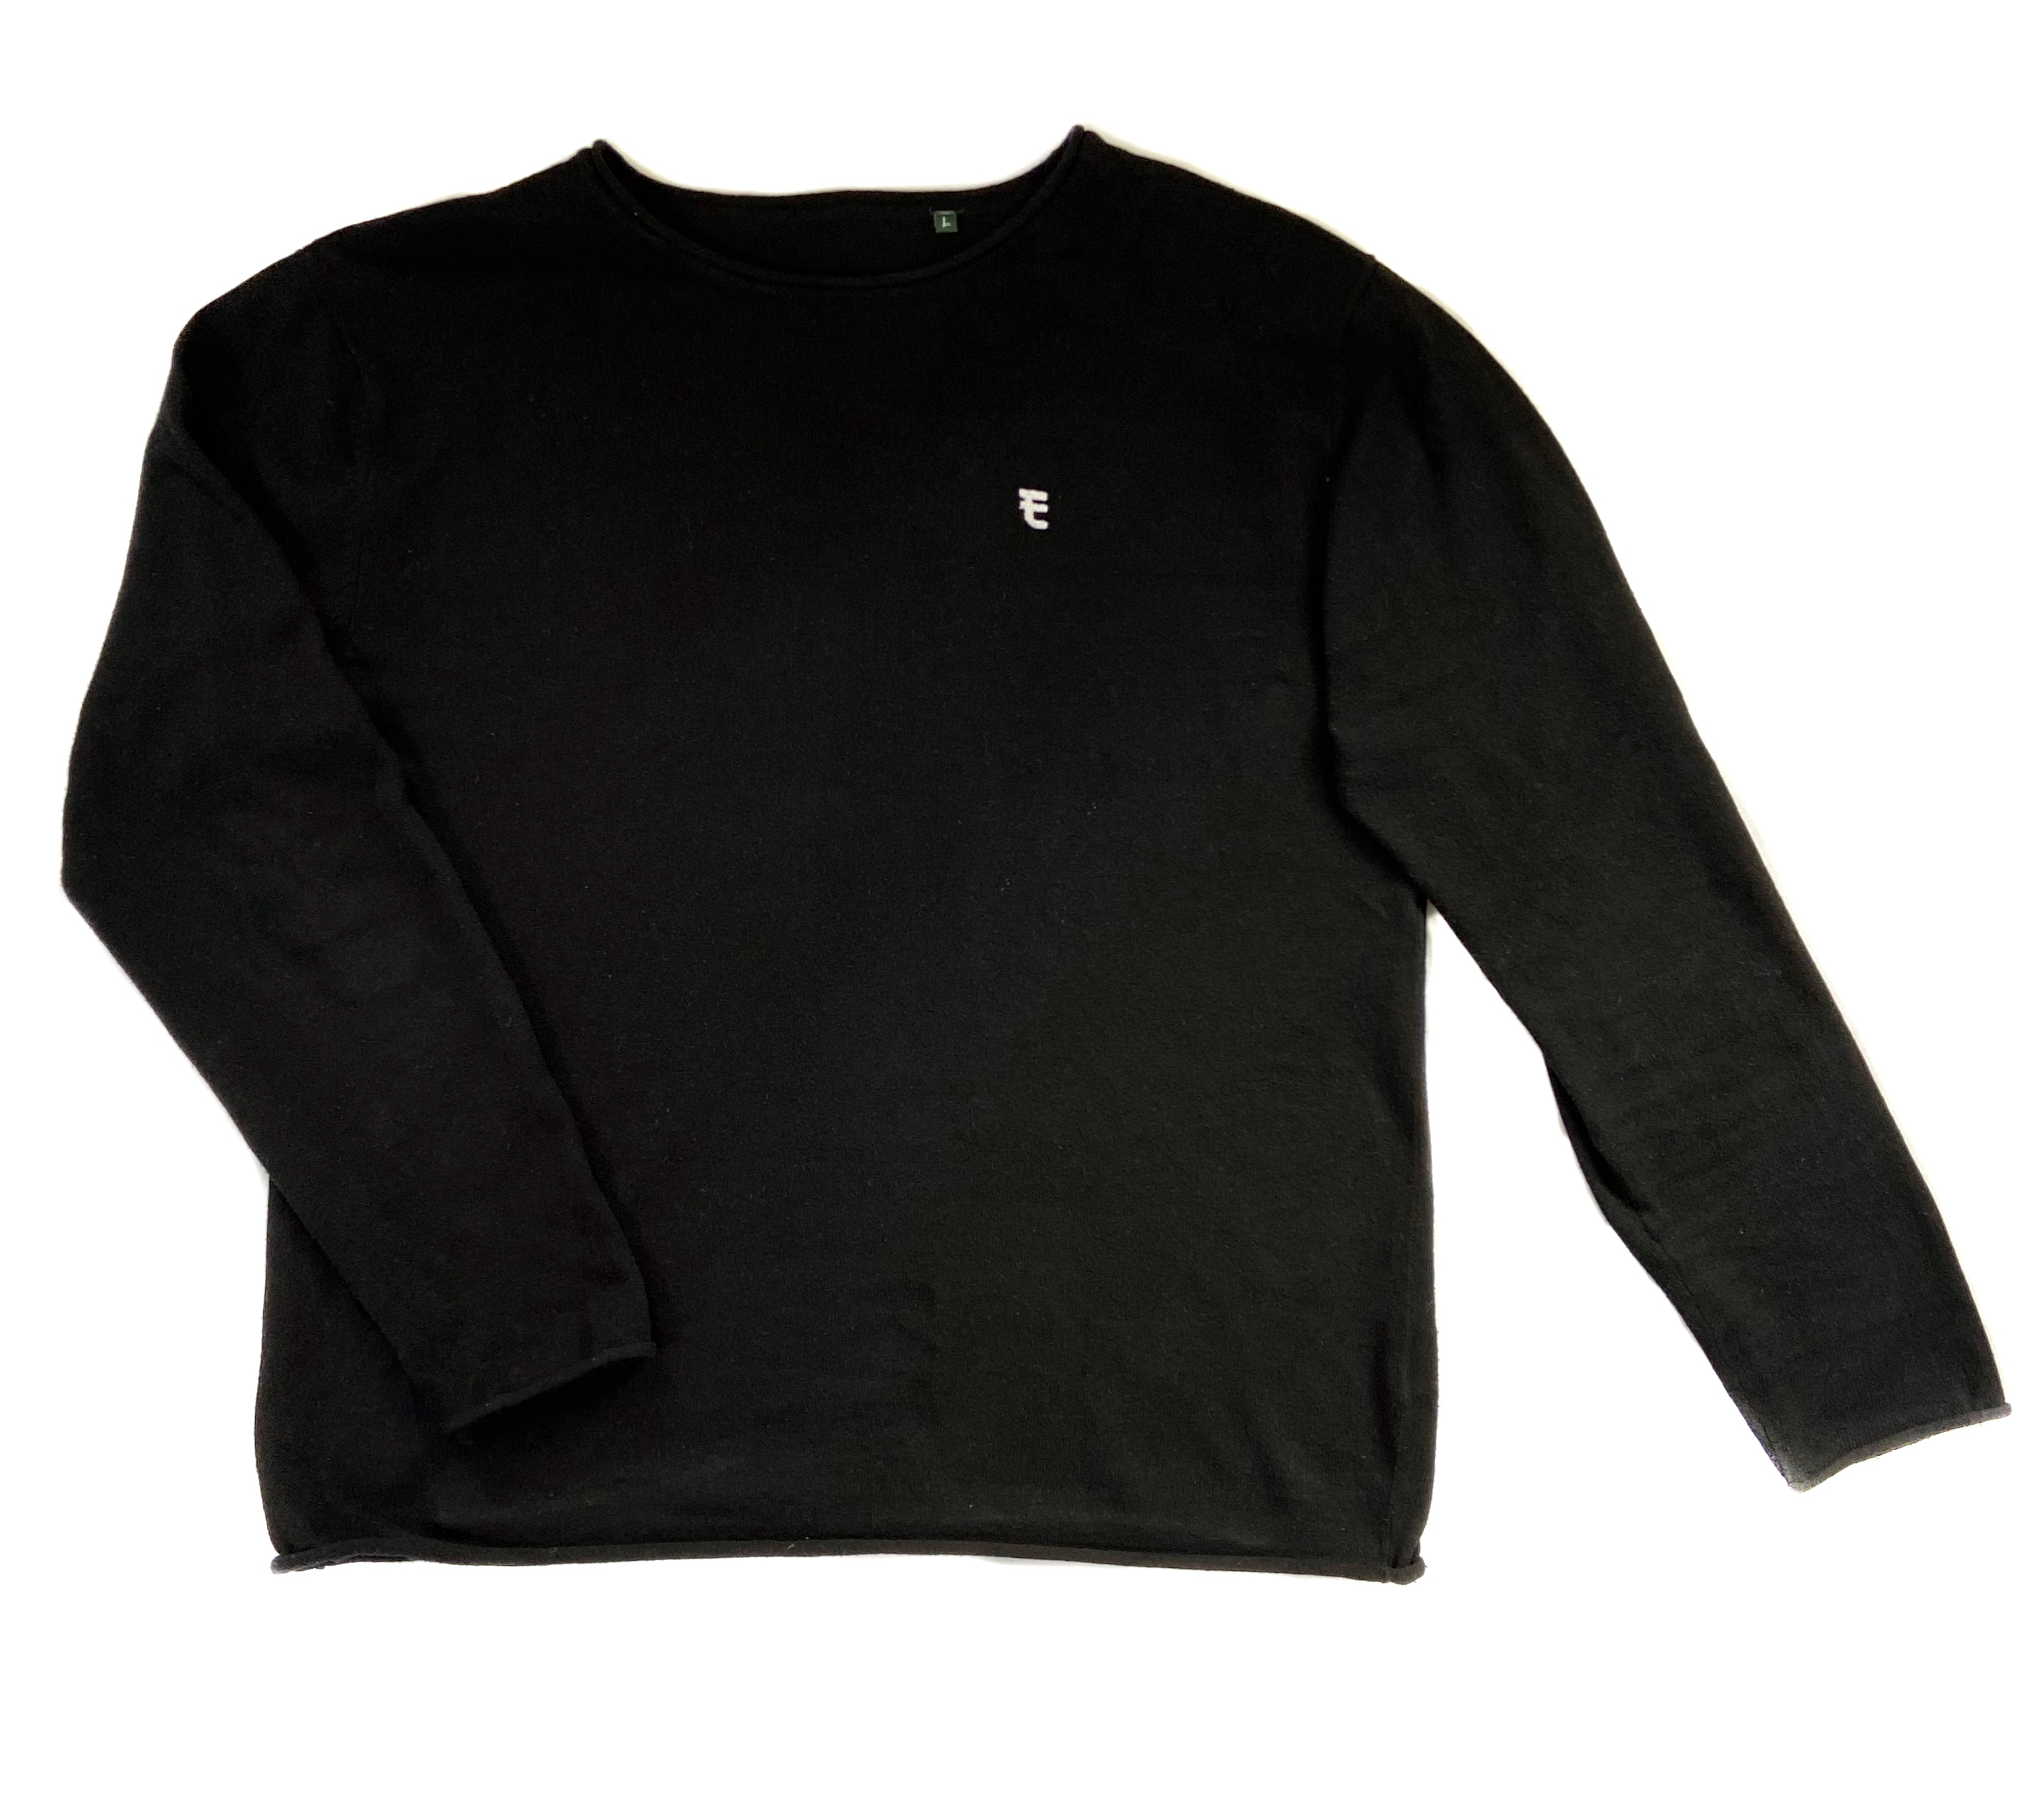 Enso ECO Sweater